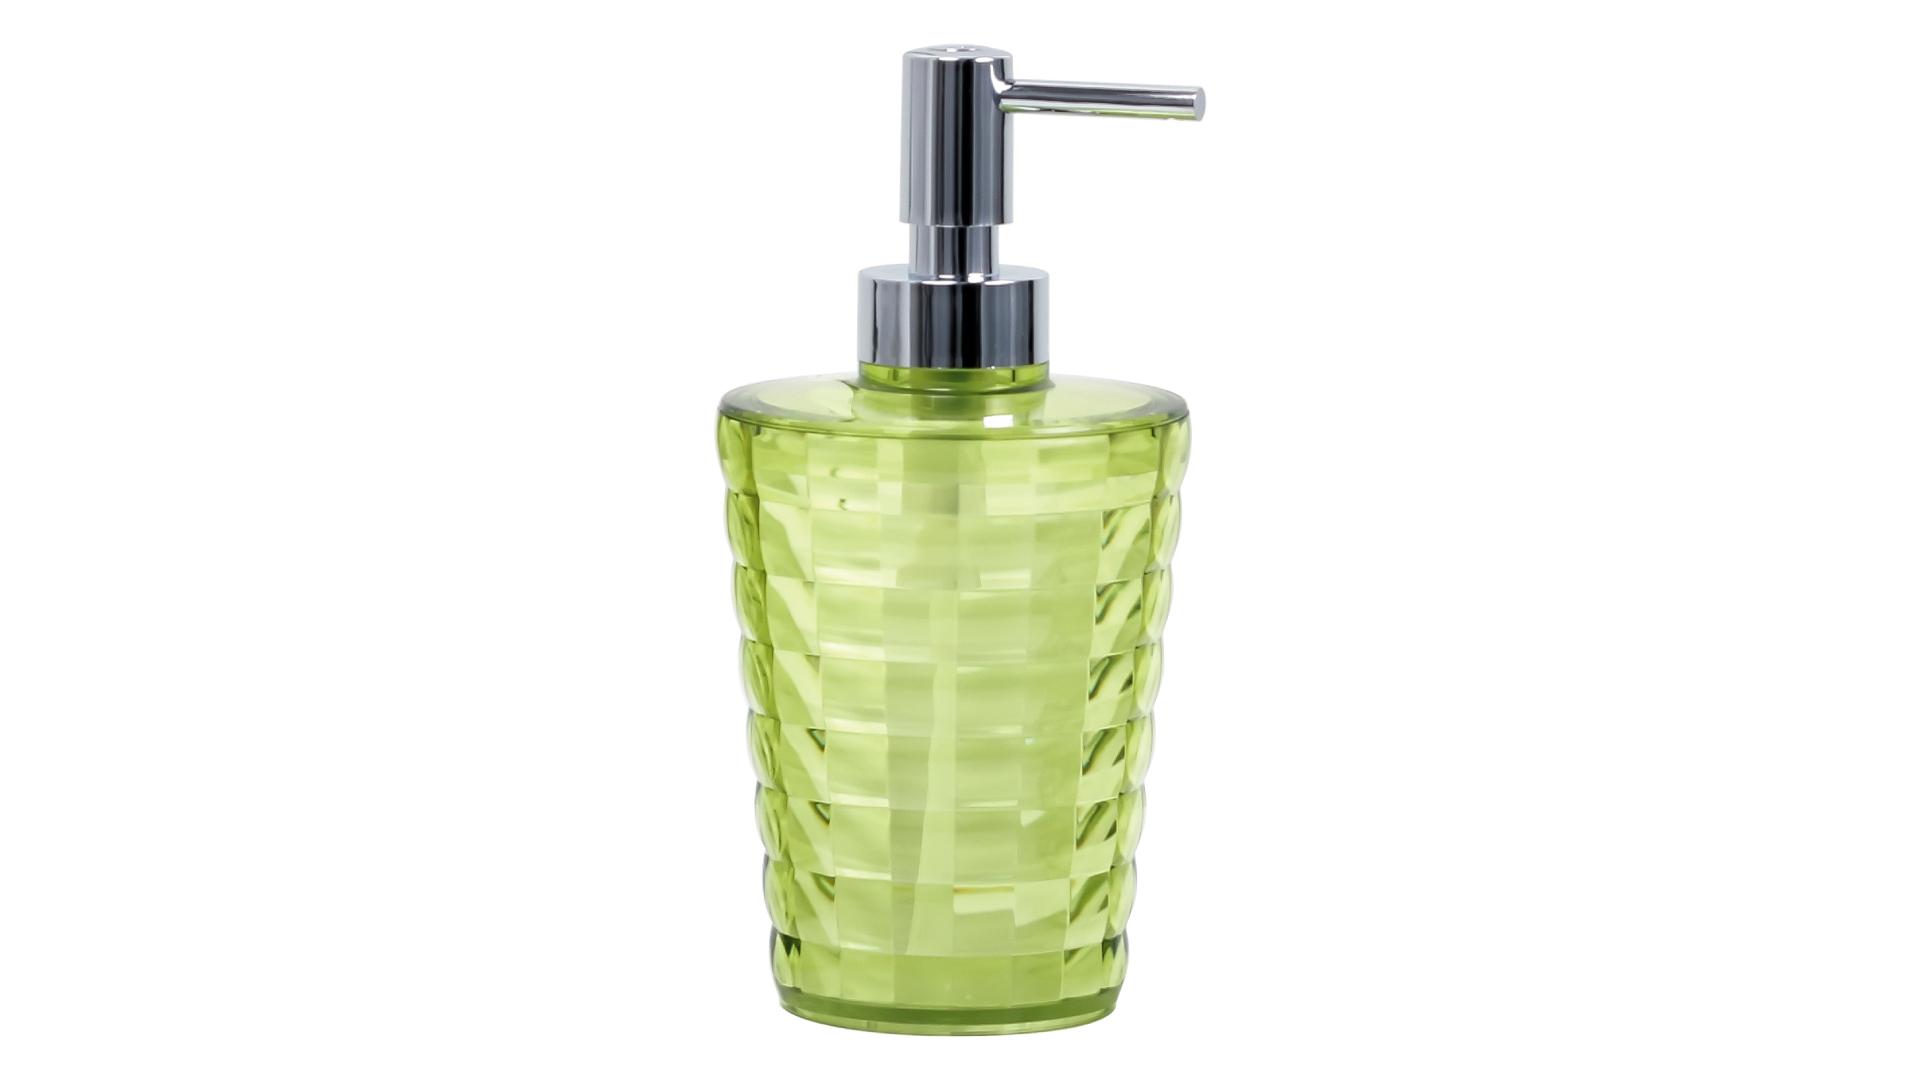 Dispensador de jabón líquido